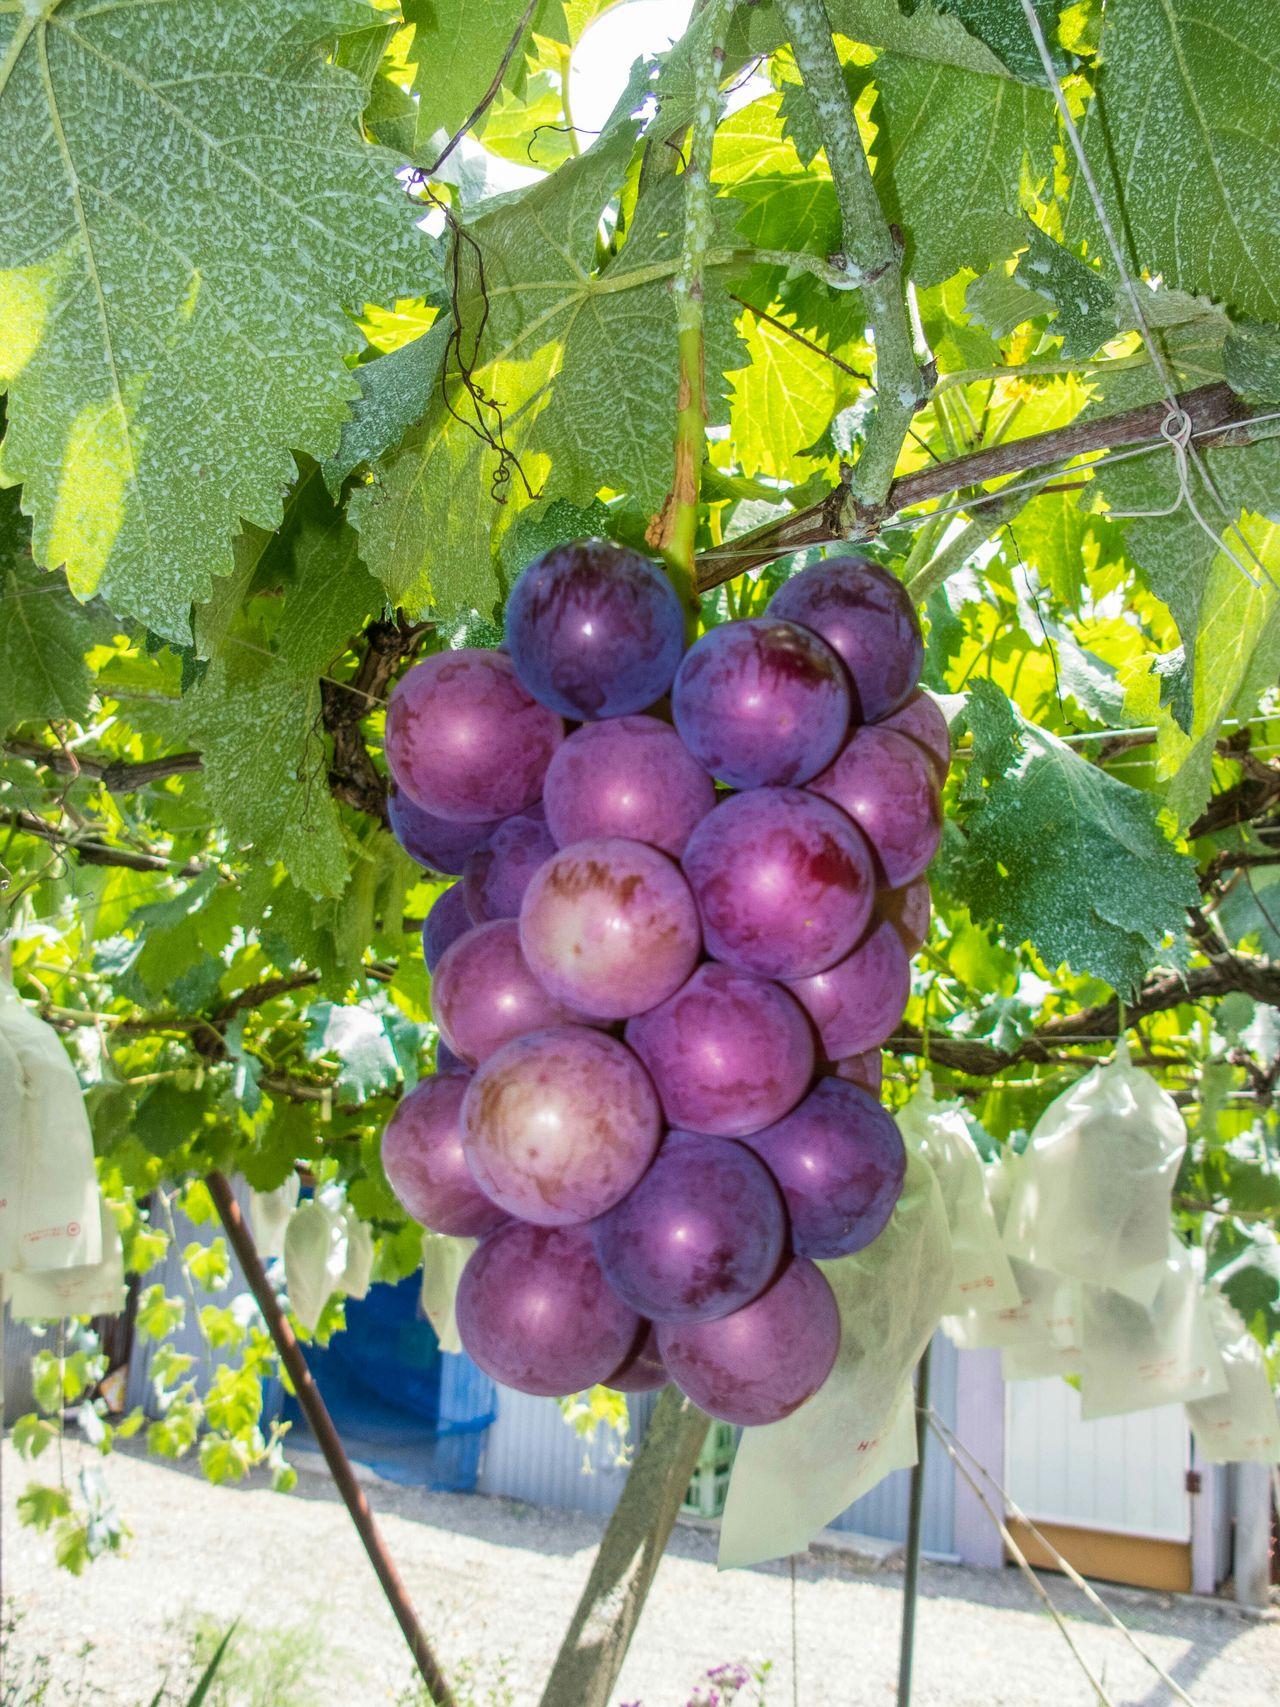 The Foodie - 2015 EyeEm Awards Budo Foodporn Foodie Food Photography Wine Winery Vin Raisins Raisin